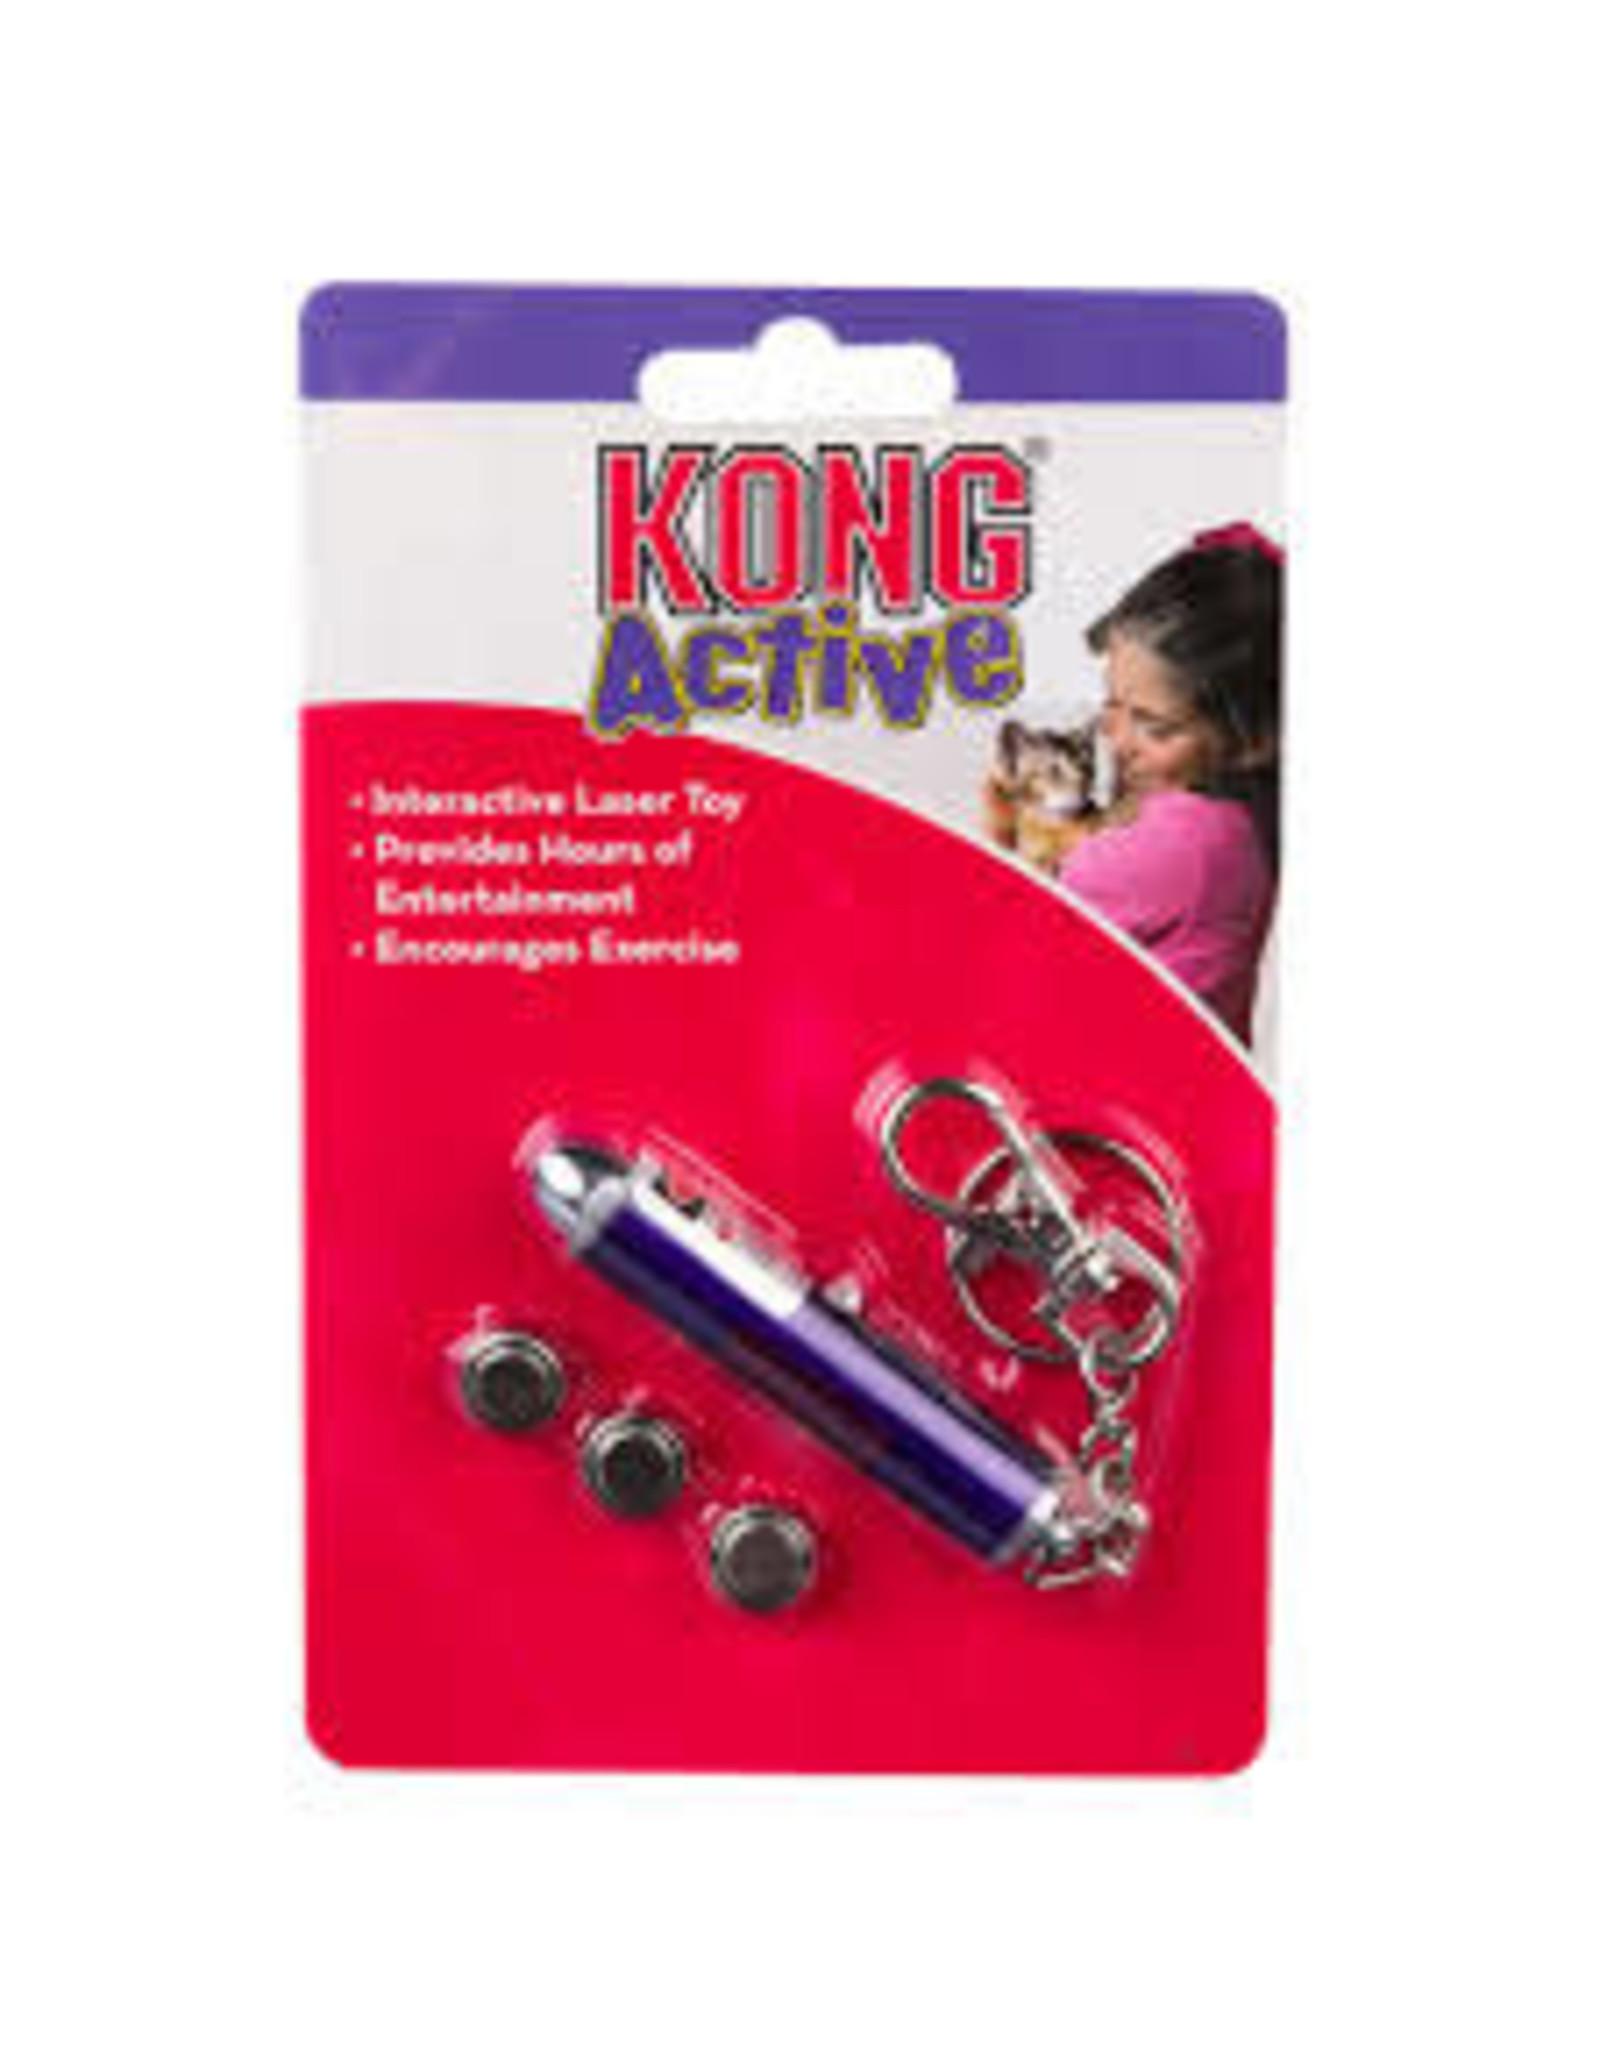 kong laser cat toy